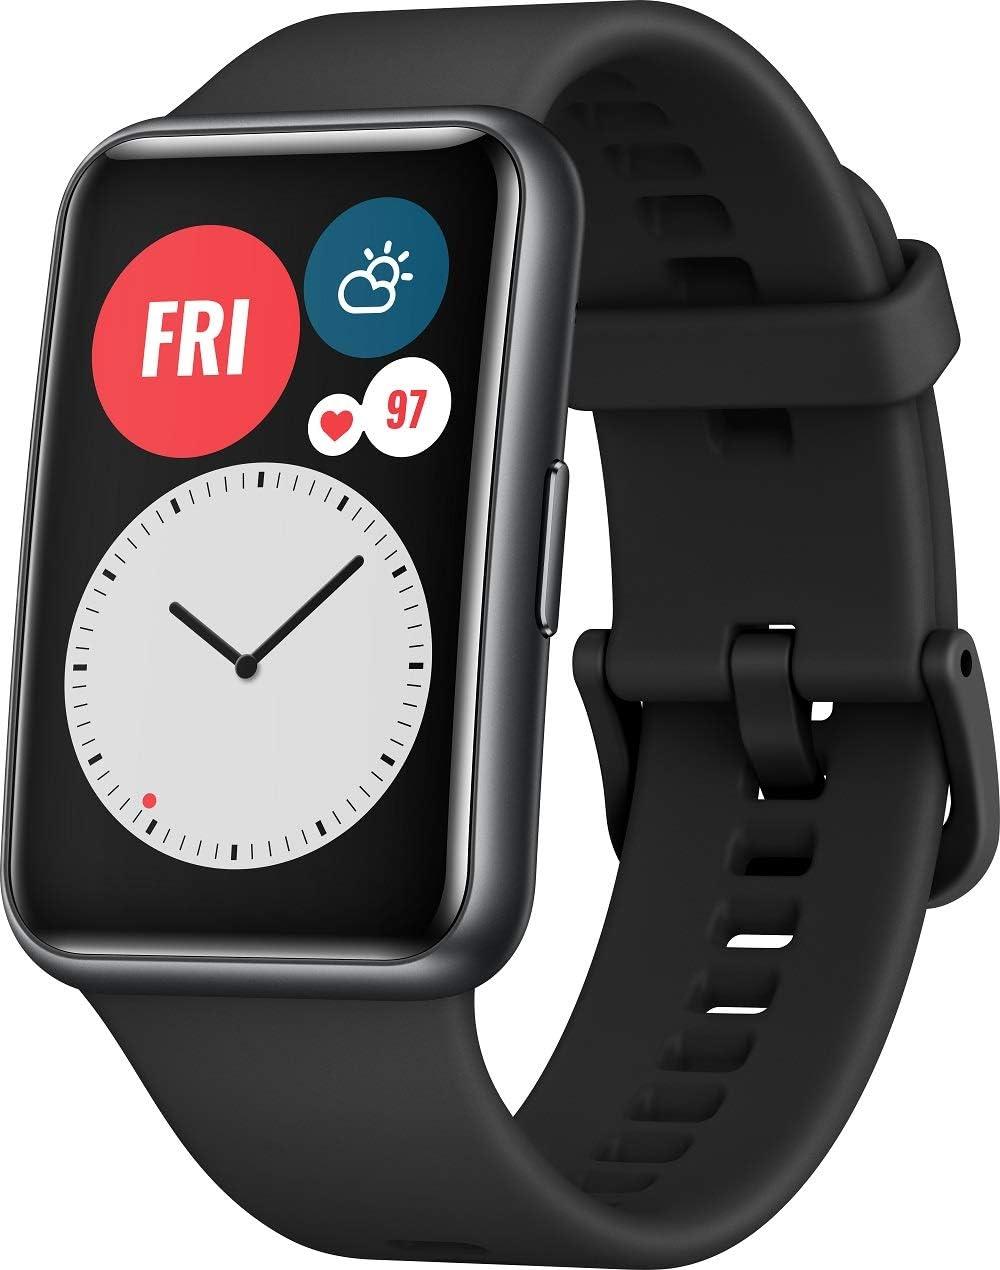 HUAWEI WATCH FIT Smartwatch, 1,64 Zoll AMOLED-Display, Quick-Workout-Animationen, 10 Tage Akkulaufzeit, 96 Trainingsmodi, GPS, 5ATM, SpO2-Sensor,…